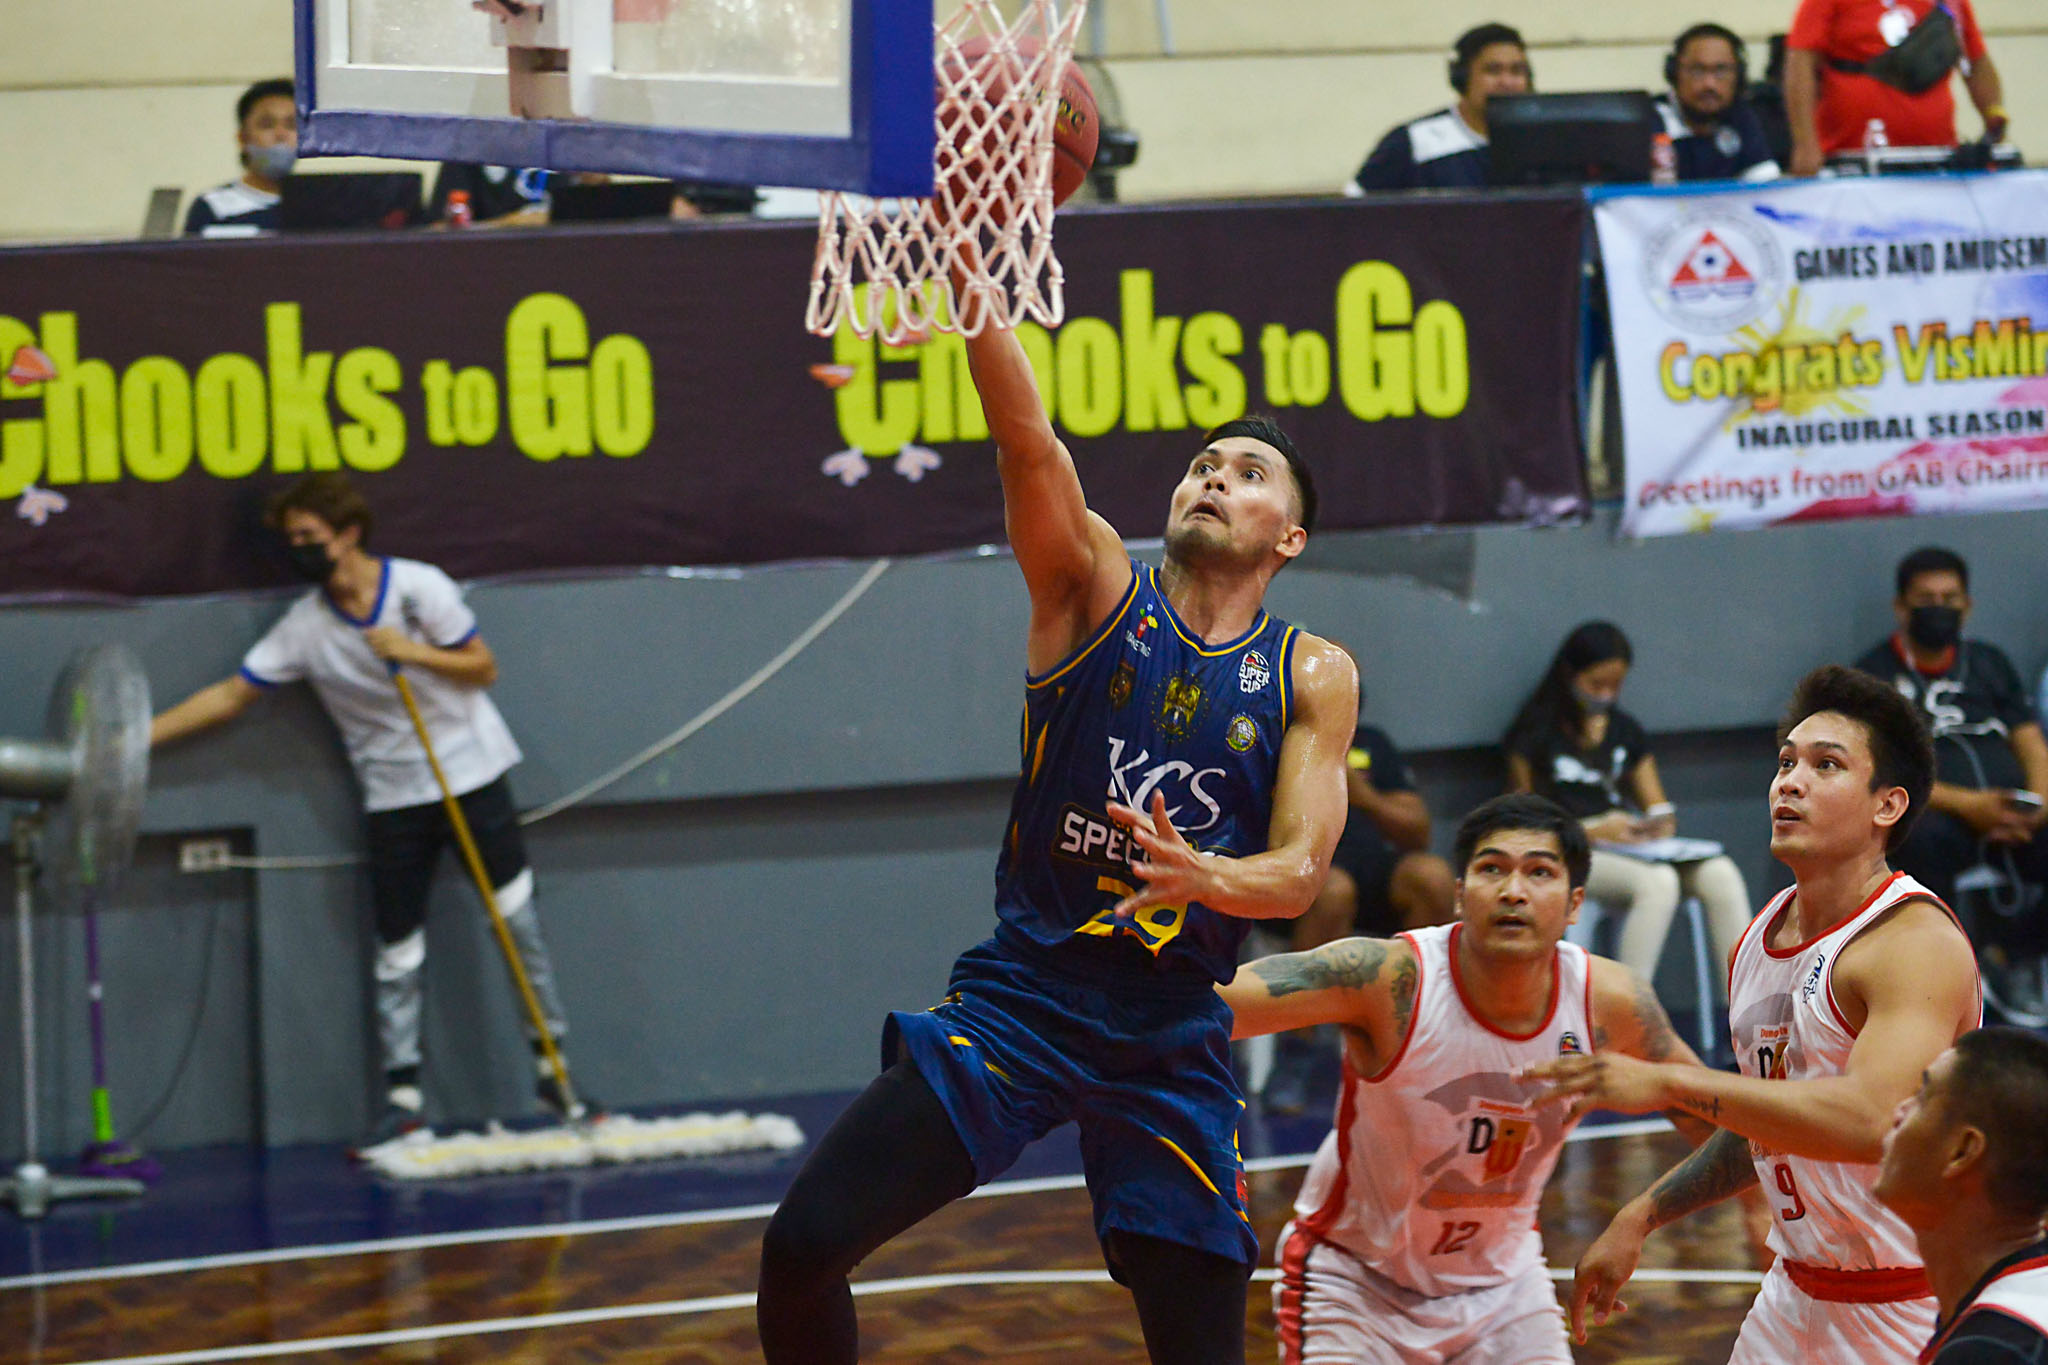 2021-Chooks-to-Go-Pilipinas-VisMin-Super-Cup-Visayas-Dumaguete-vs-KCS-Mandaue-Gryann-Mendoza Gryann Mendoza has no regrets with PBA career: 'Blessing sa akin yung pinagdaanan ko' Basketball News VisMin Super Cup  - philippine sports news